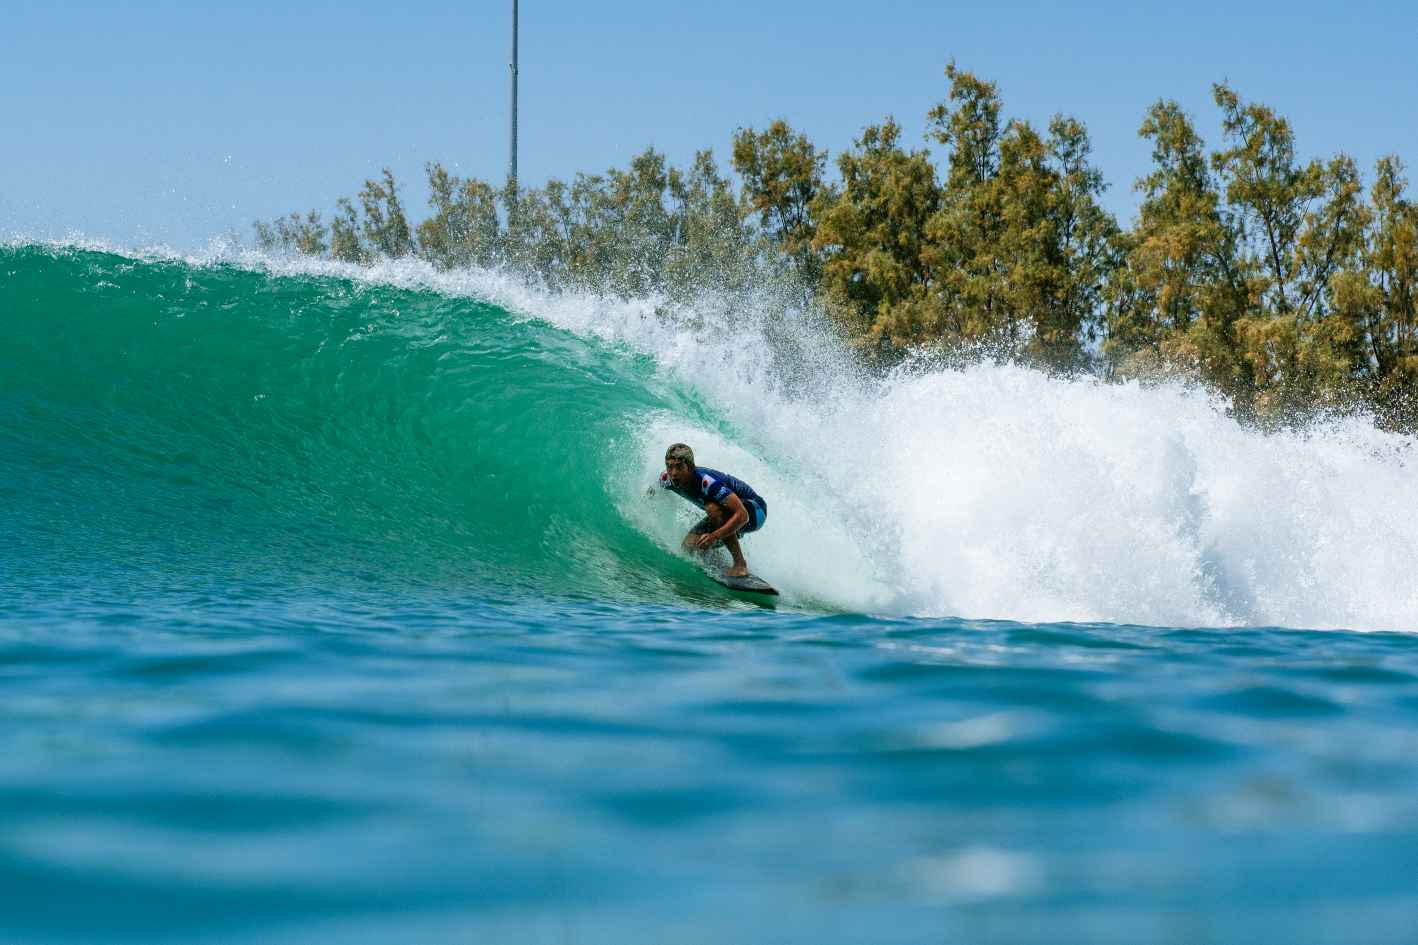 surf30 surf ranch pro 2021 wsl surf Igarashi K Ranch21 PNN 2678